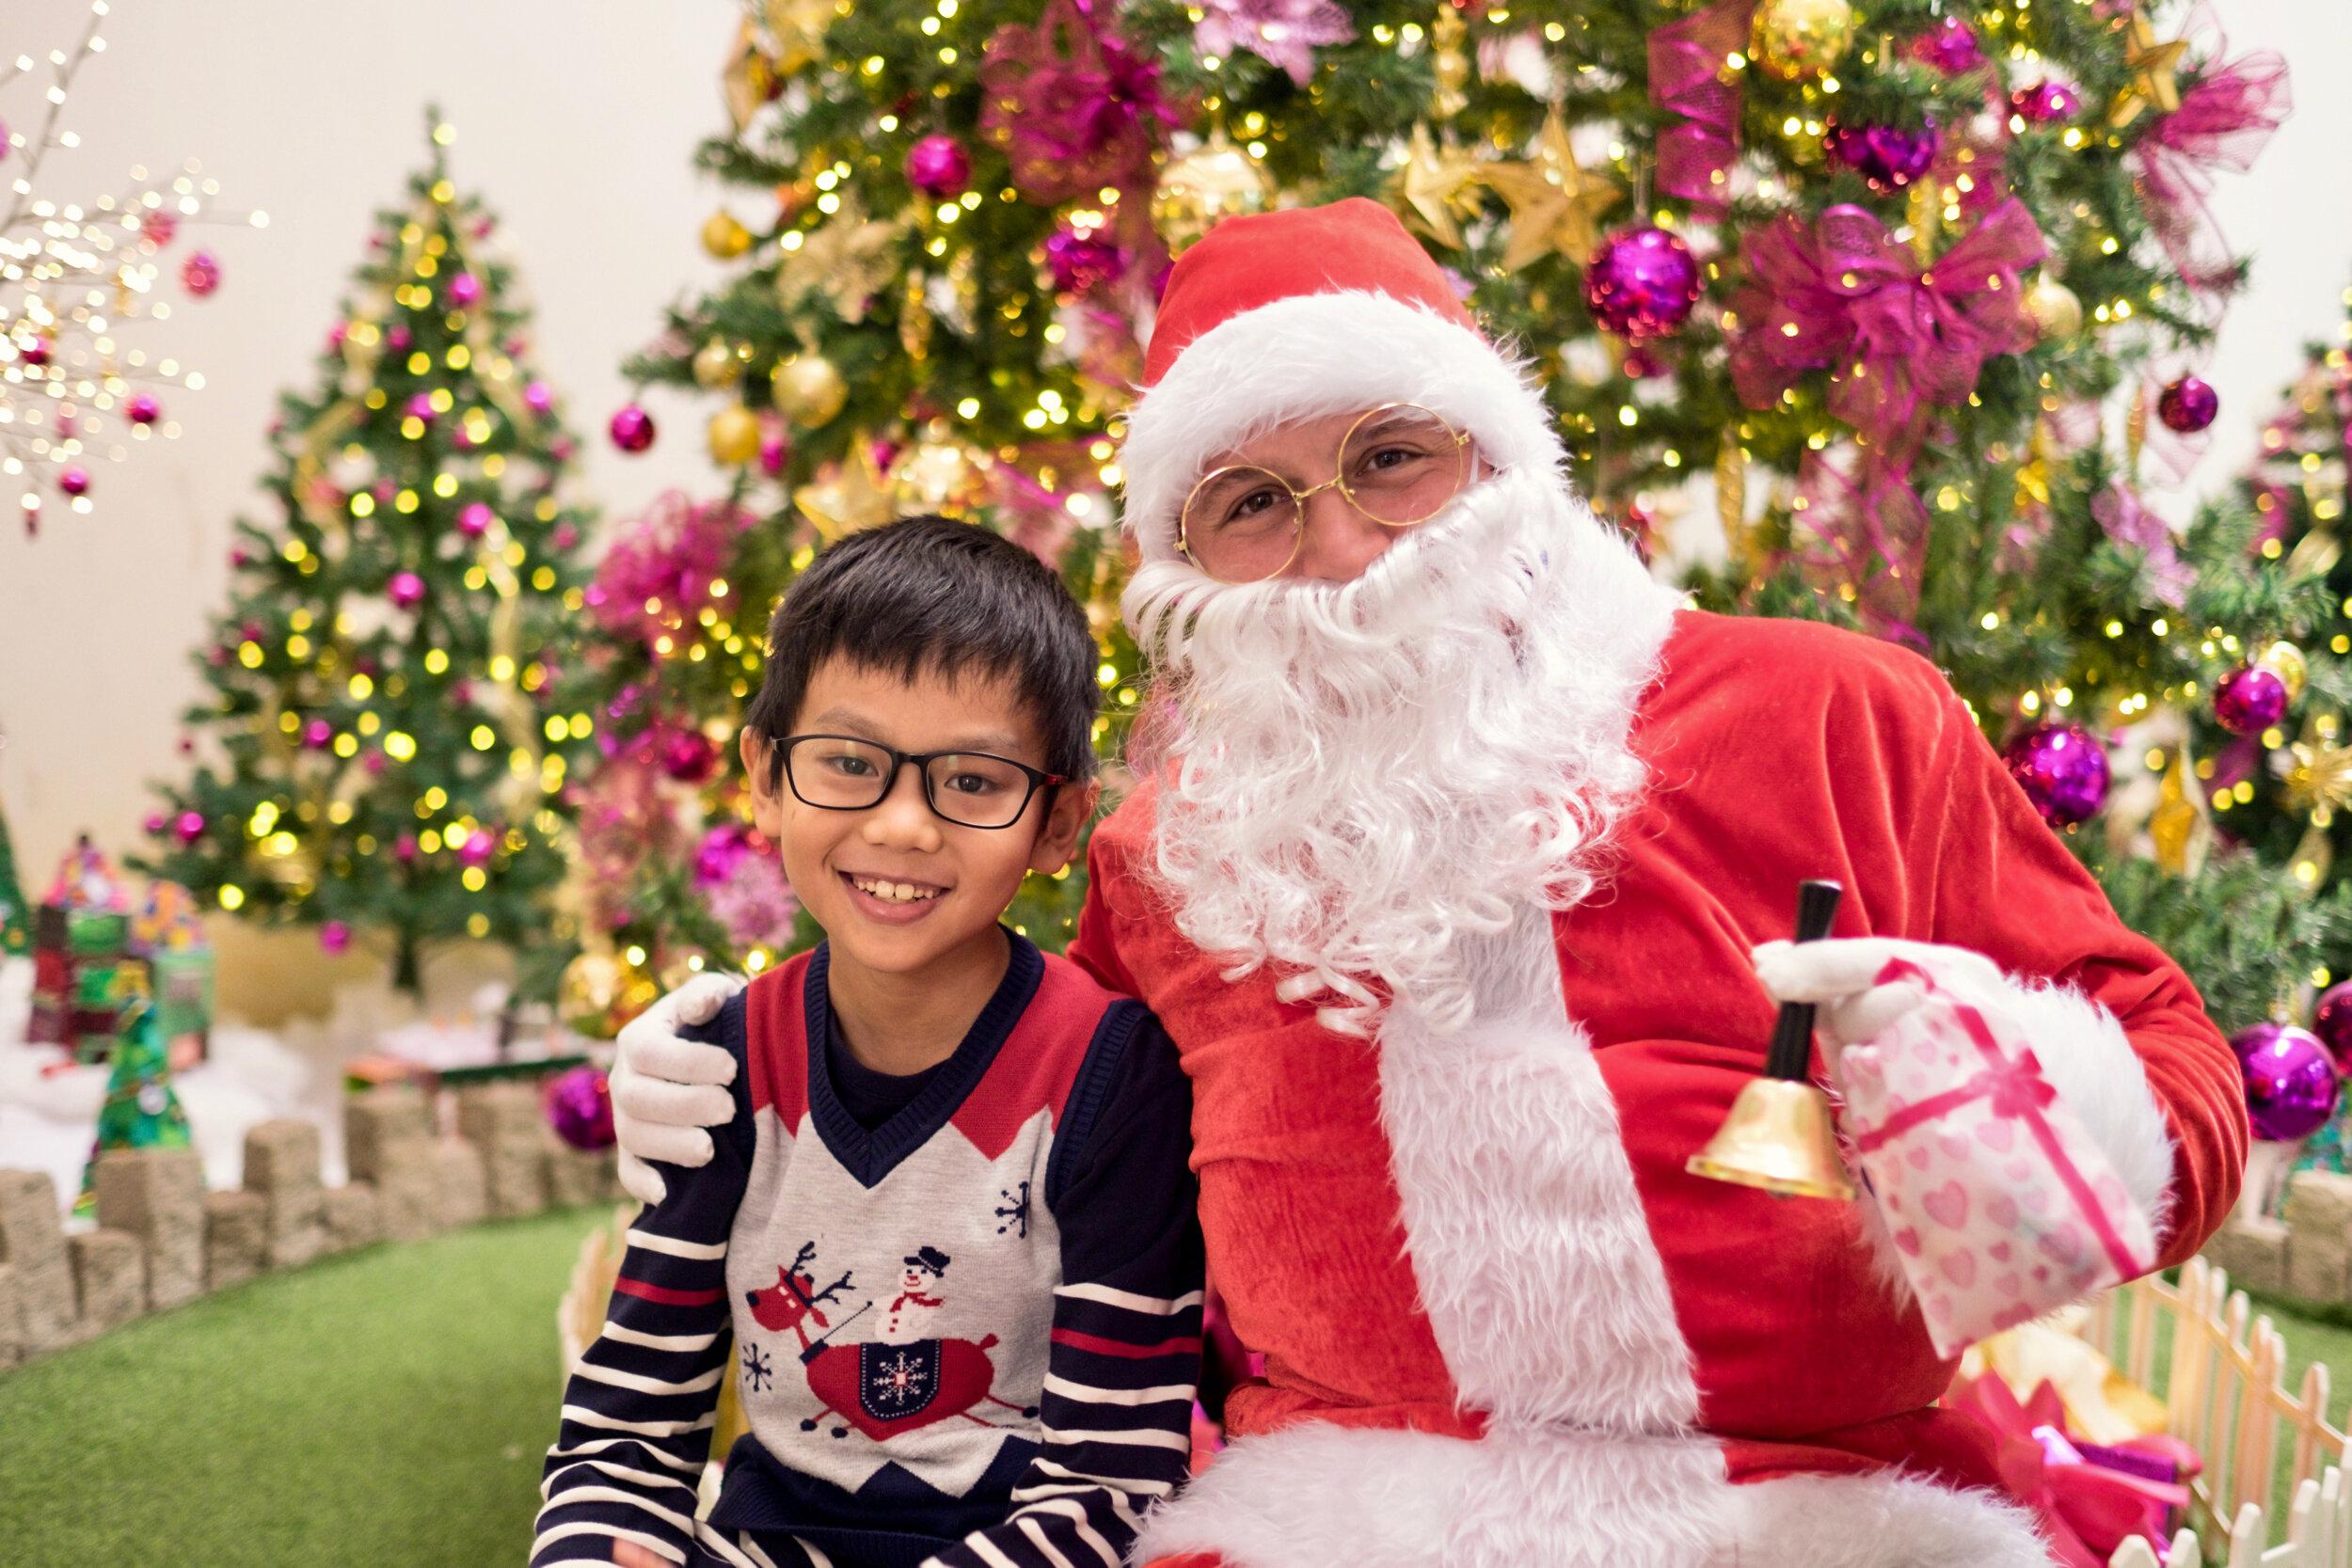 Photoshoot with Santa Clause-199.jpg